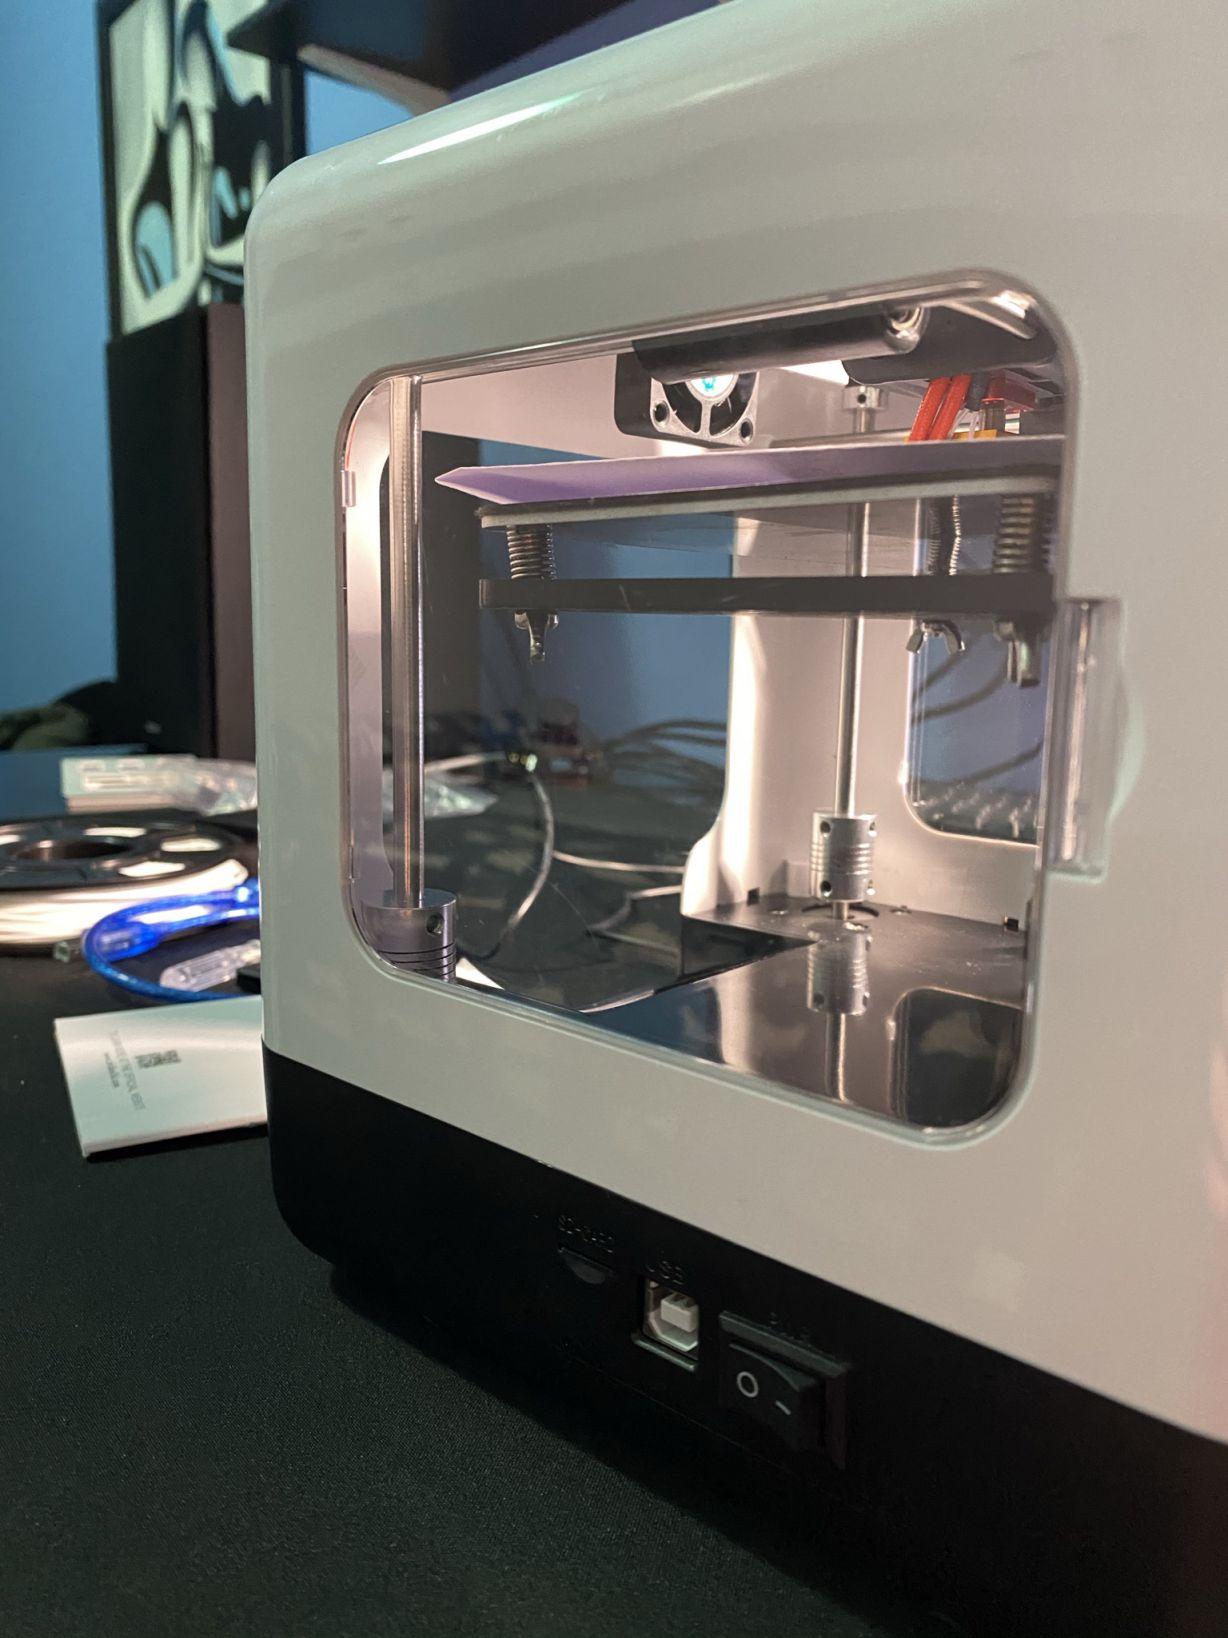 recensione-stampante-3d-flucrum-minibot-11 Recensione FULCRUM MINIBOT, Stampante 3D Facile e Veloce